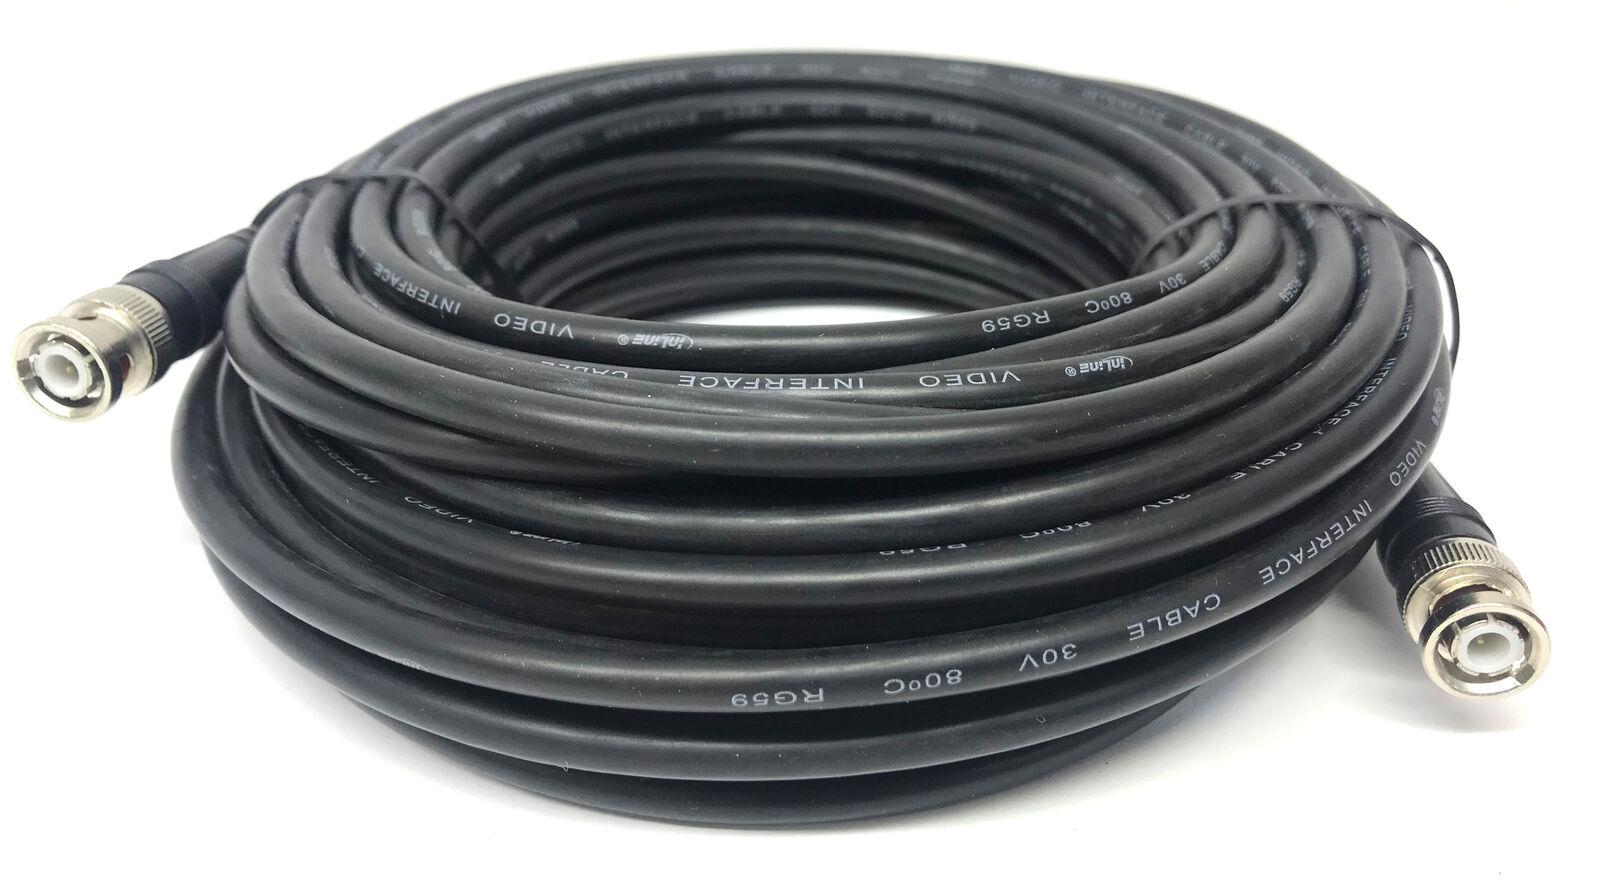 15m BNC KABEL | Video Kabel | RG59 | 75 Ohm | BNC Stecker auf BNC Stecker